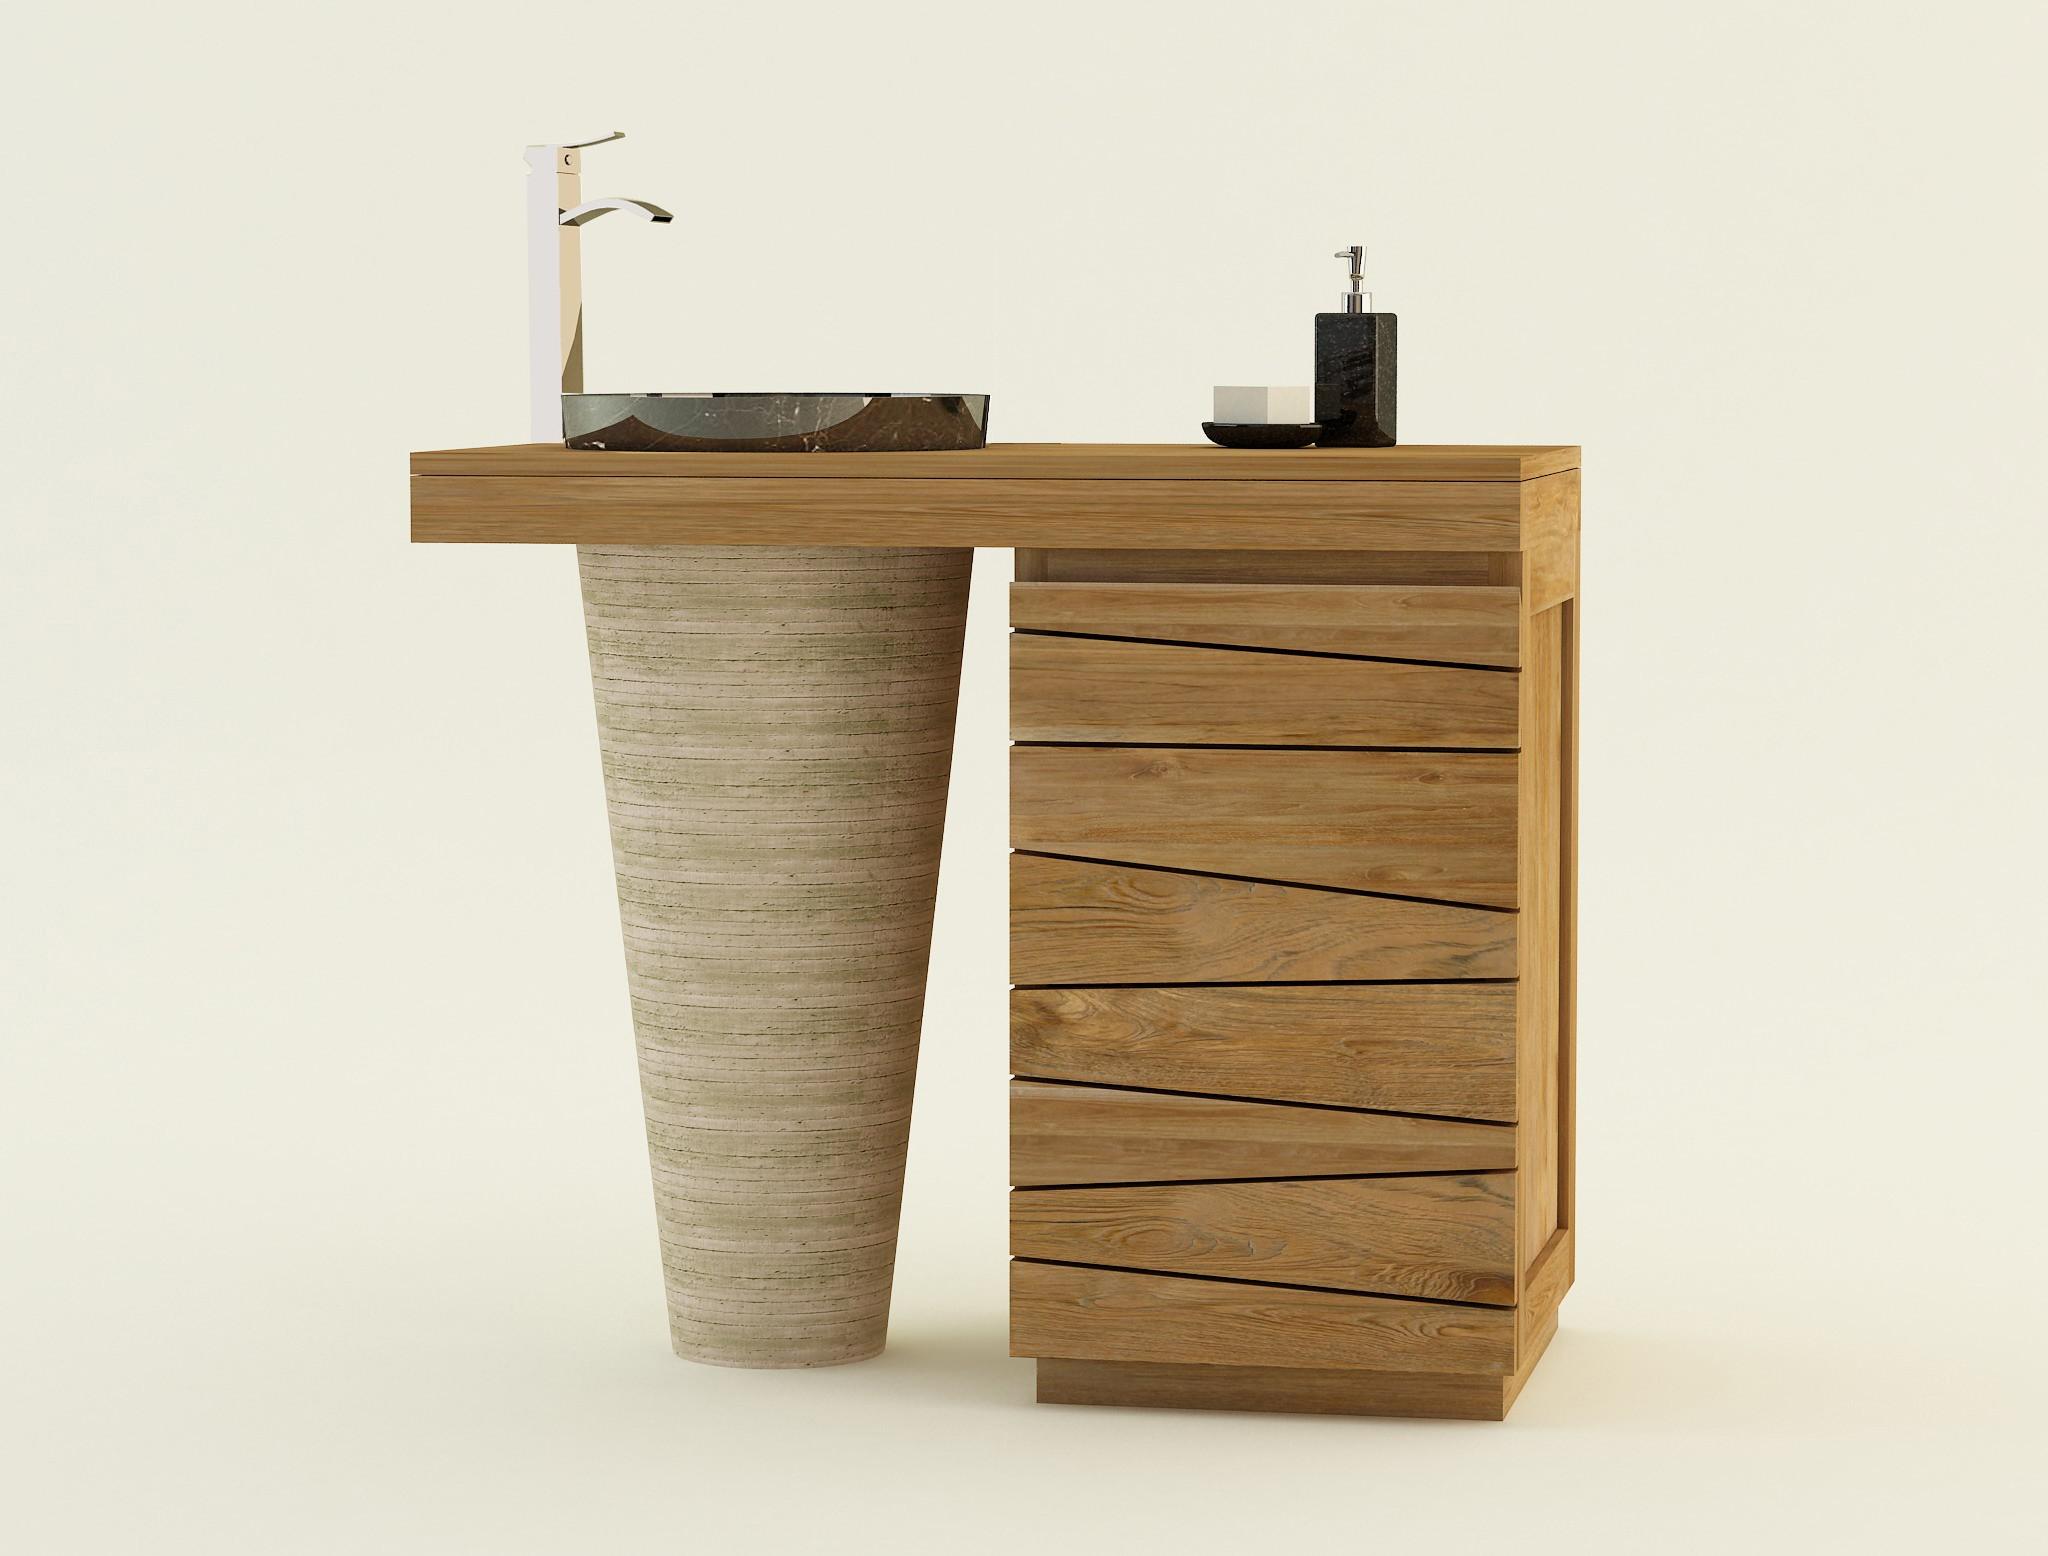 Meuble salle de bain bois simple vasque noel 2017 for Meuble salle de bain simple vasque